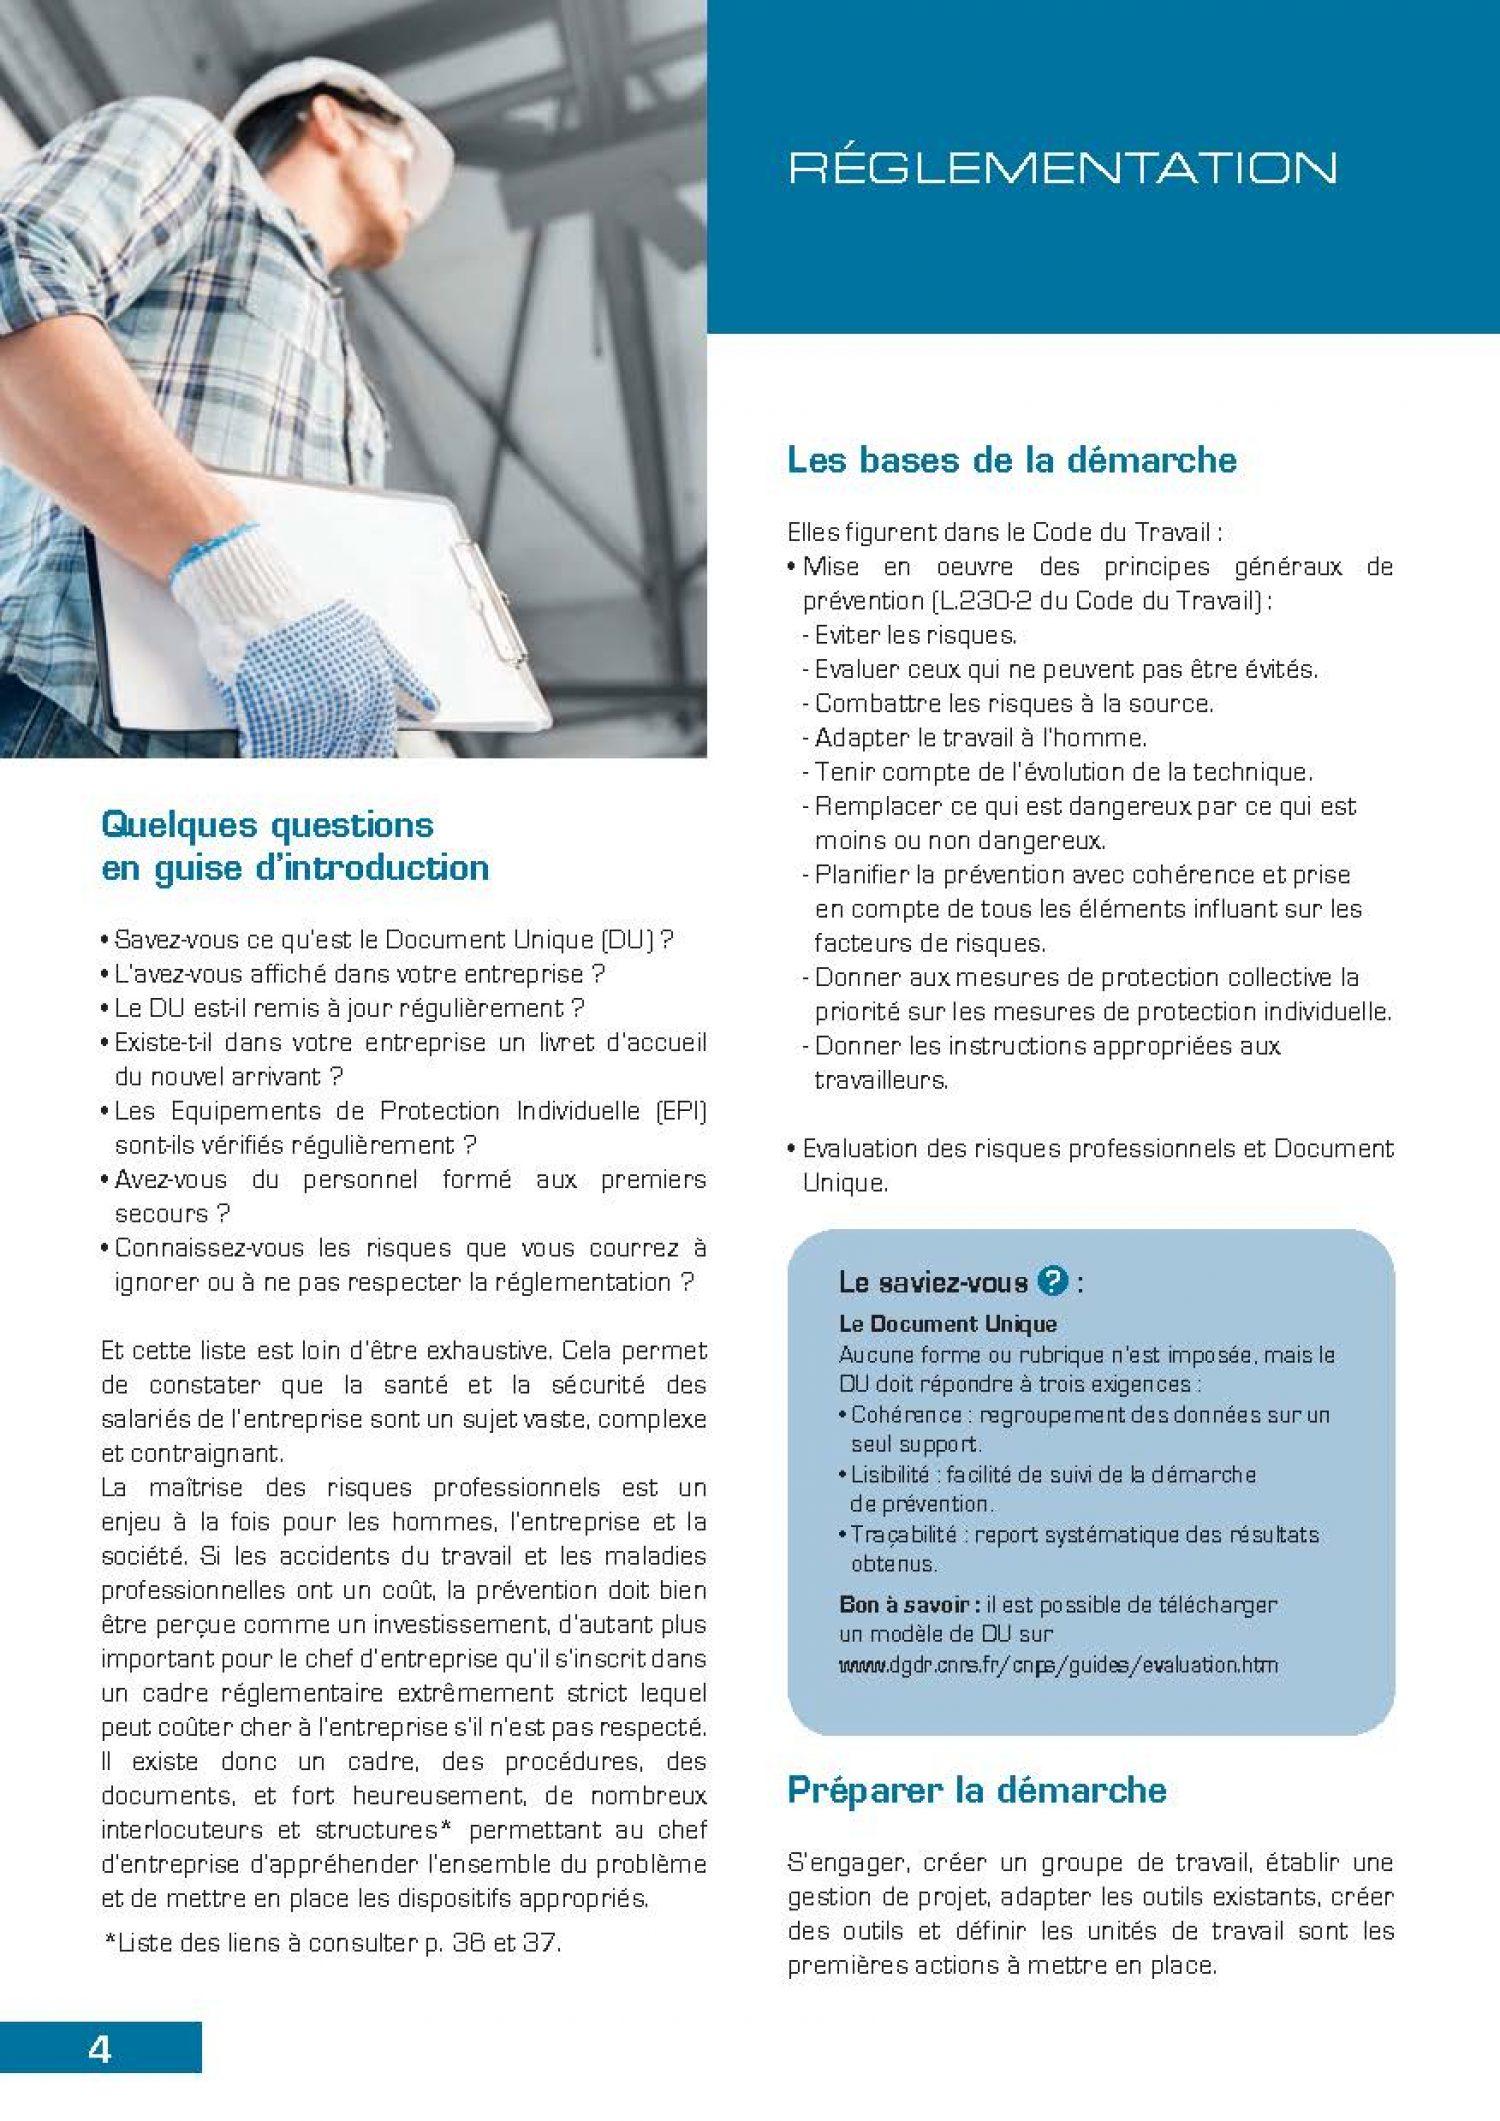 Guide Securite au Travail 2014 HDpdf_Page_04